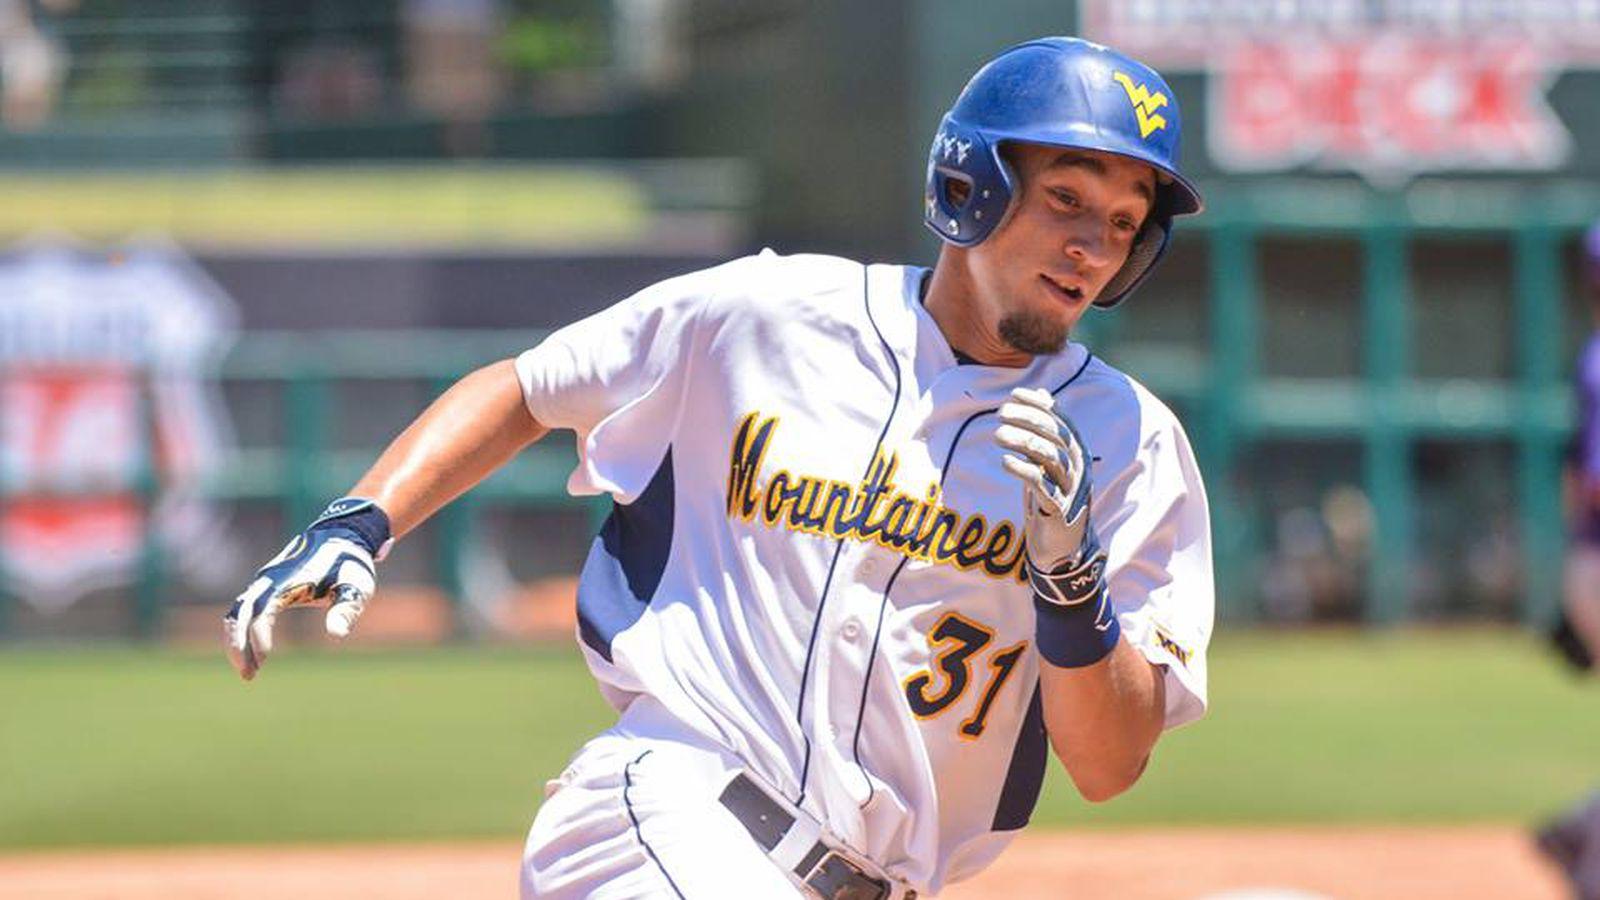 Geoff_coyle_baseball.0